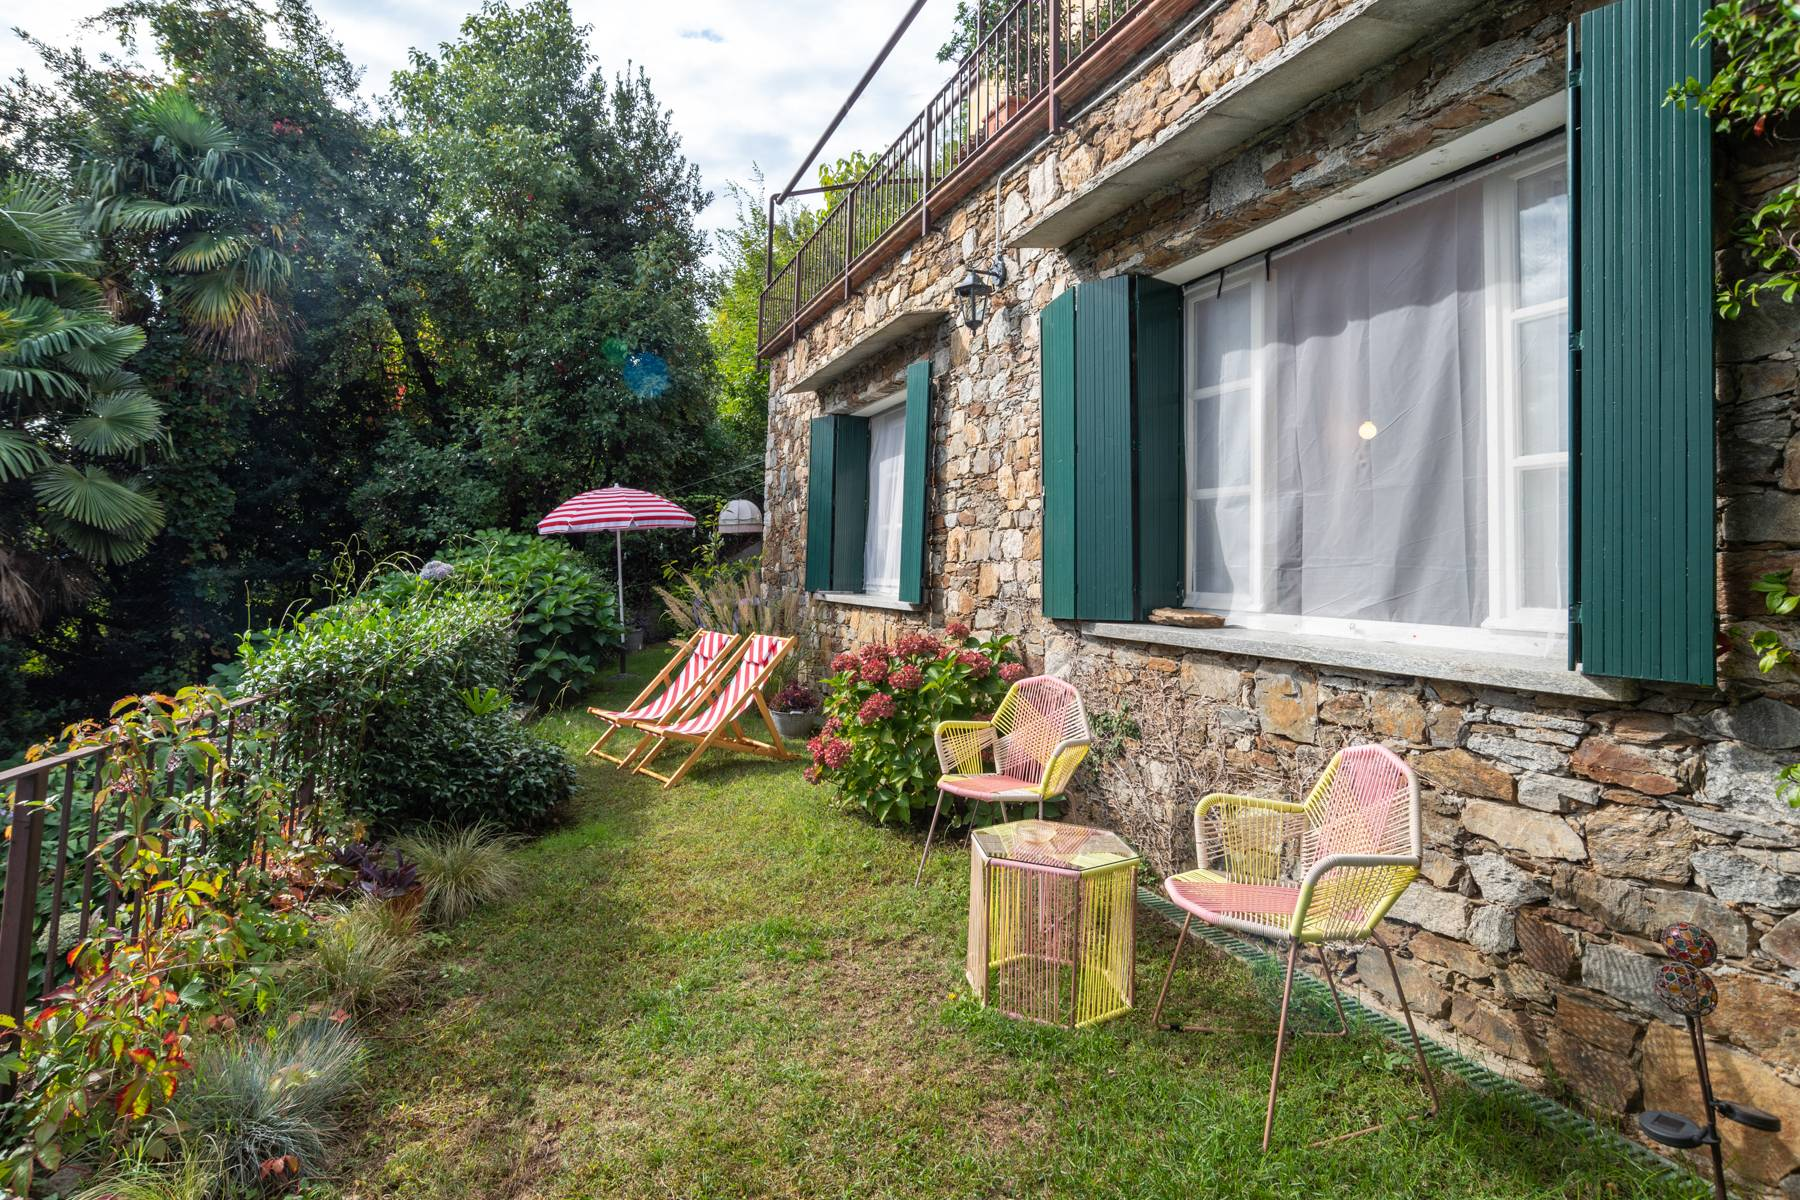 Elegant apartment in the small hamlet of Belgirate - 22